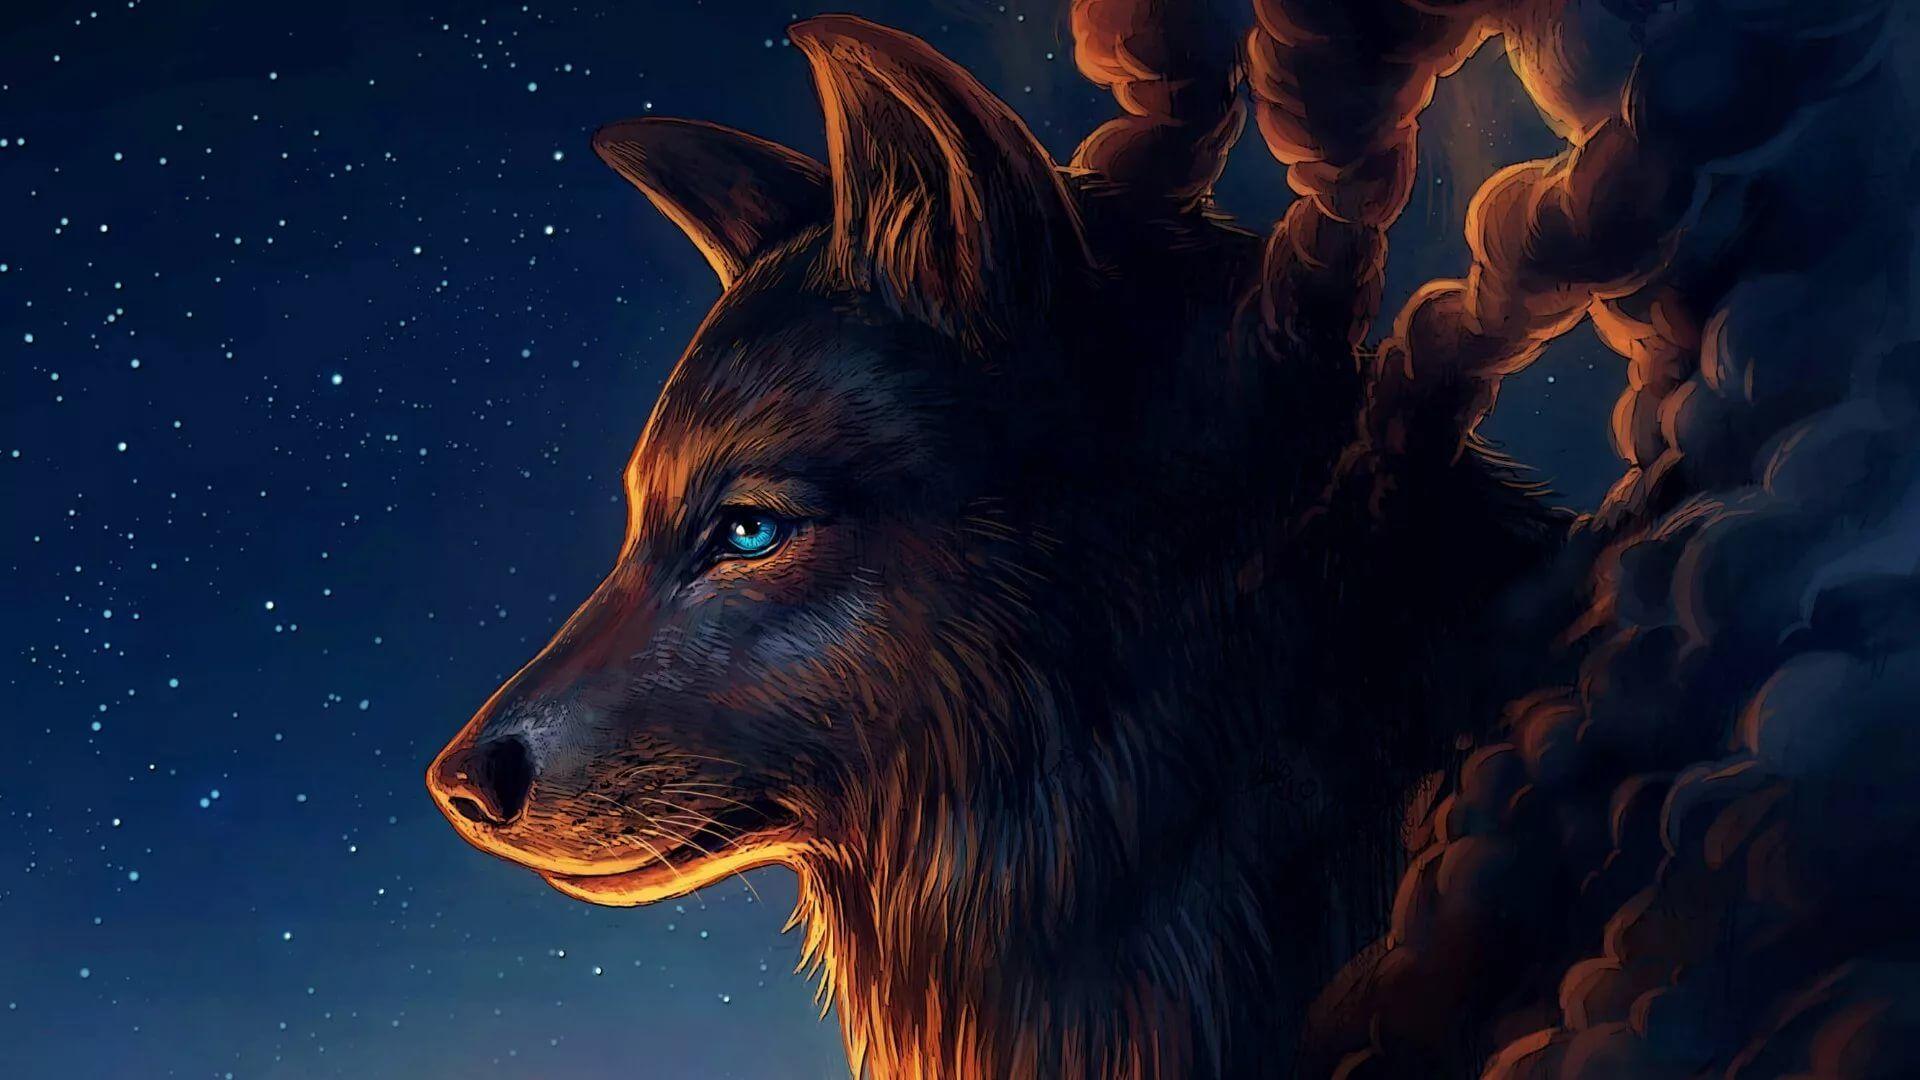 Cool Wolf HD Wallpaper